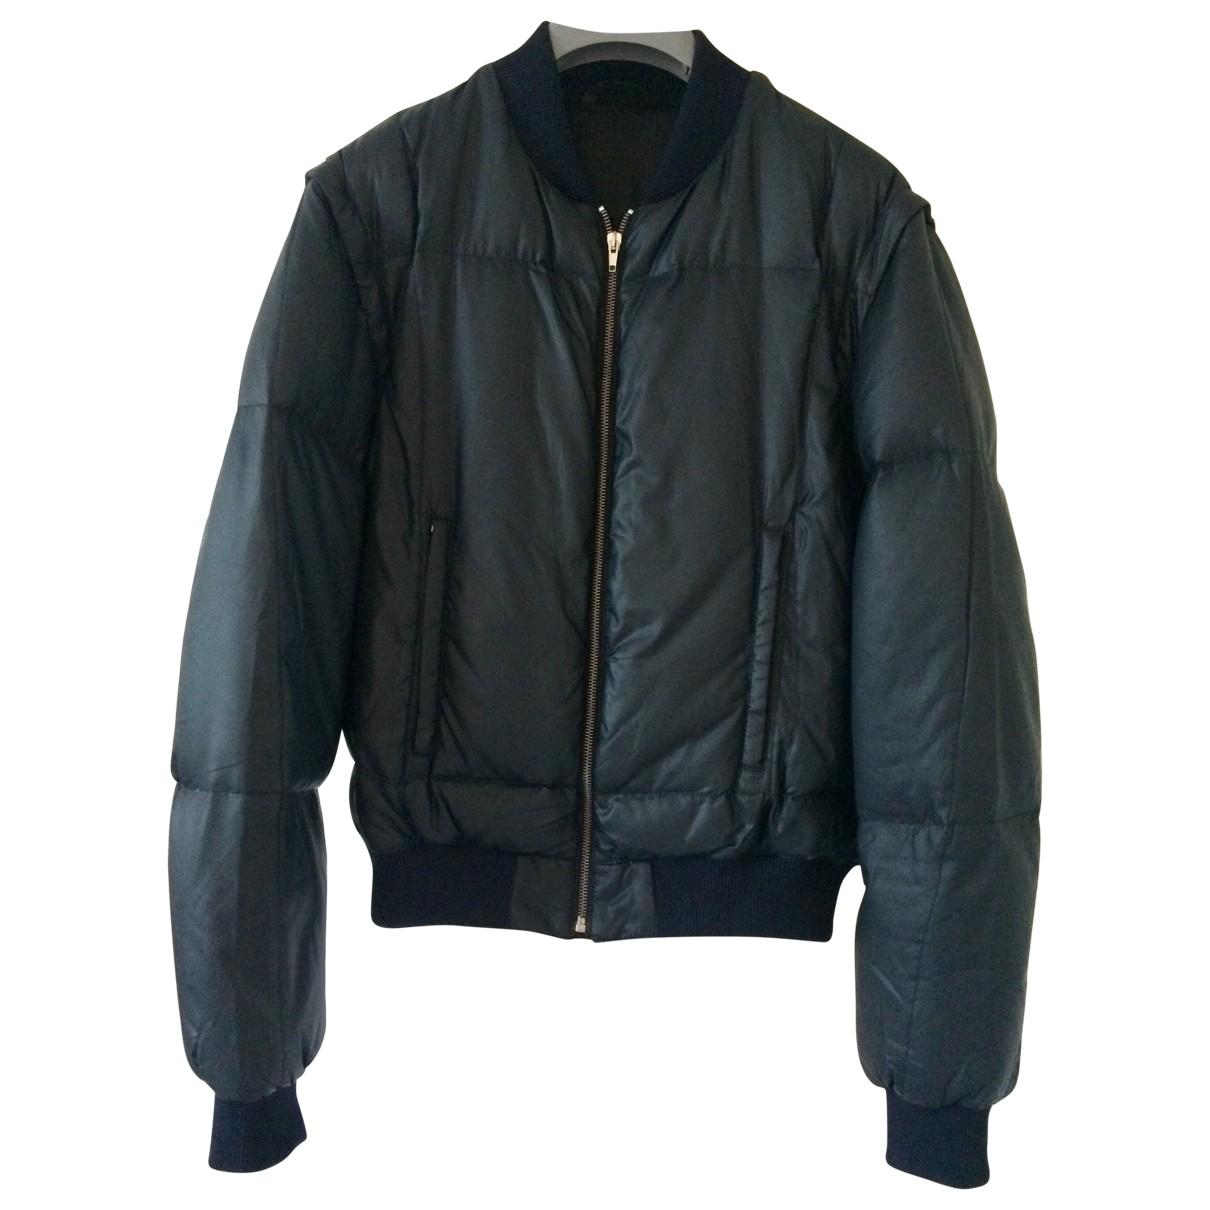 Raf Simons - Manteau   pour homme - marine